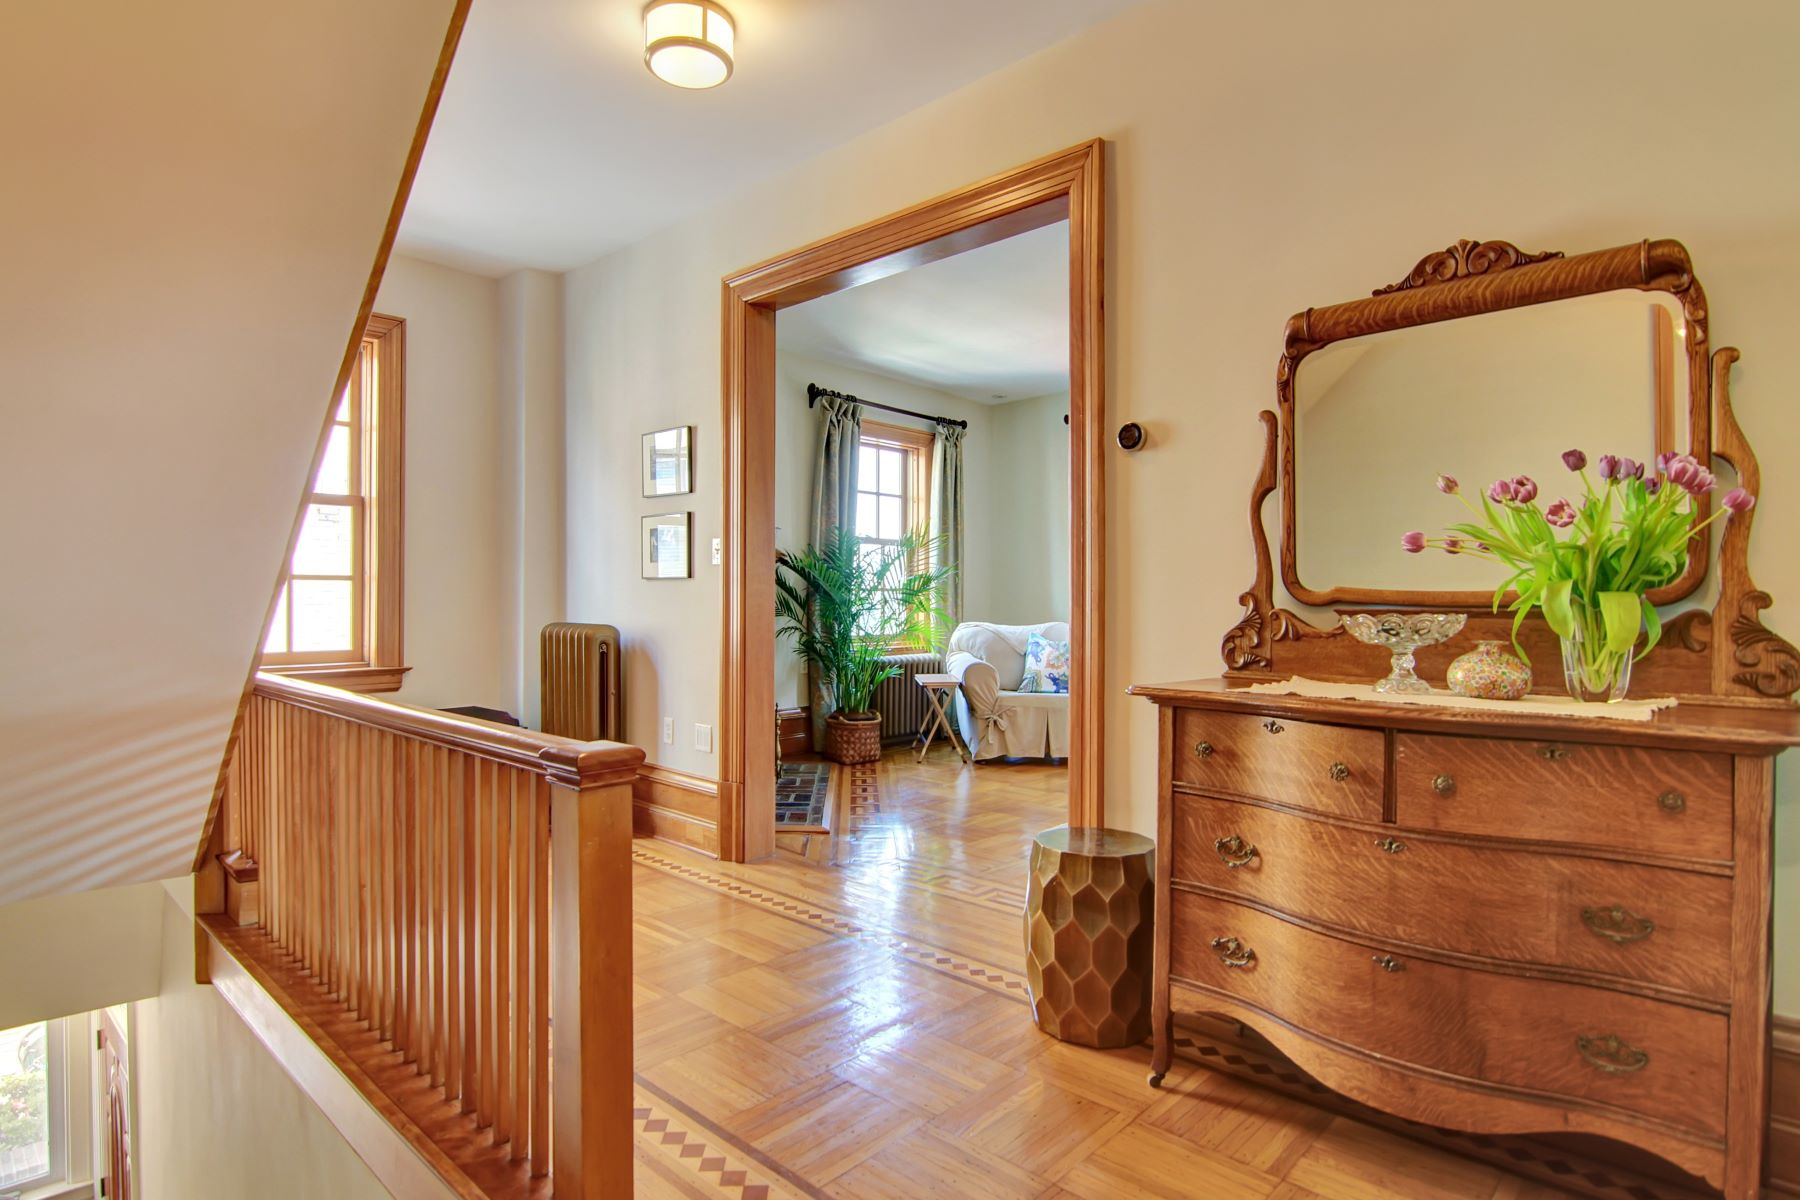 Частный односемейный дом для того Аренда на Panoramic views, custom design and detail blended with historic charm 825 BLVD East #2 Weehawken, Нью-Джерси 07086 Соединенные Штаты